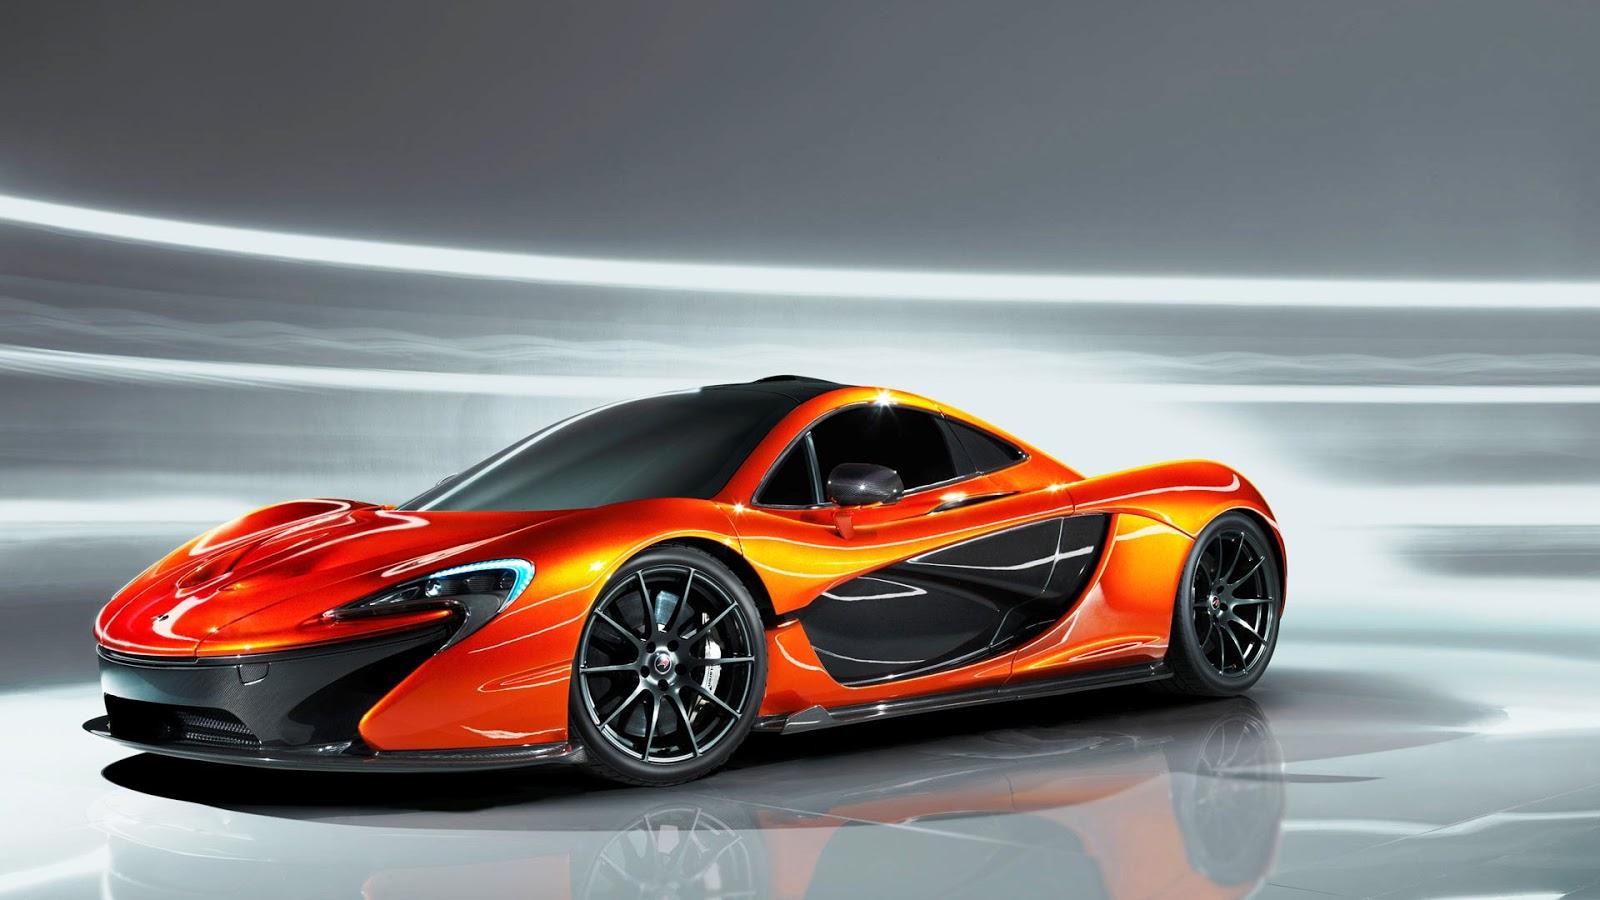 Full HD Exotic Car Wallpapers: 2012 McLaren P1 Concept